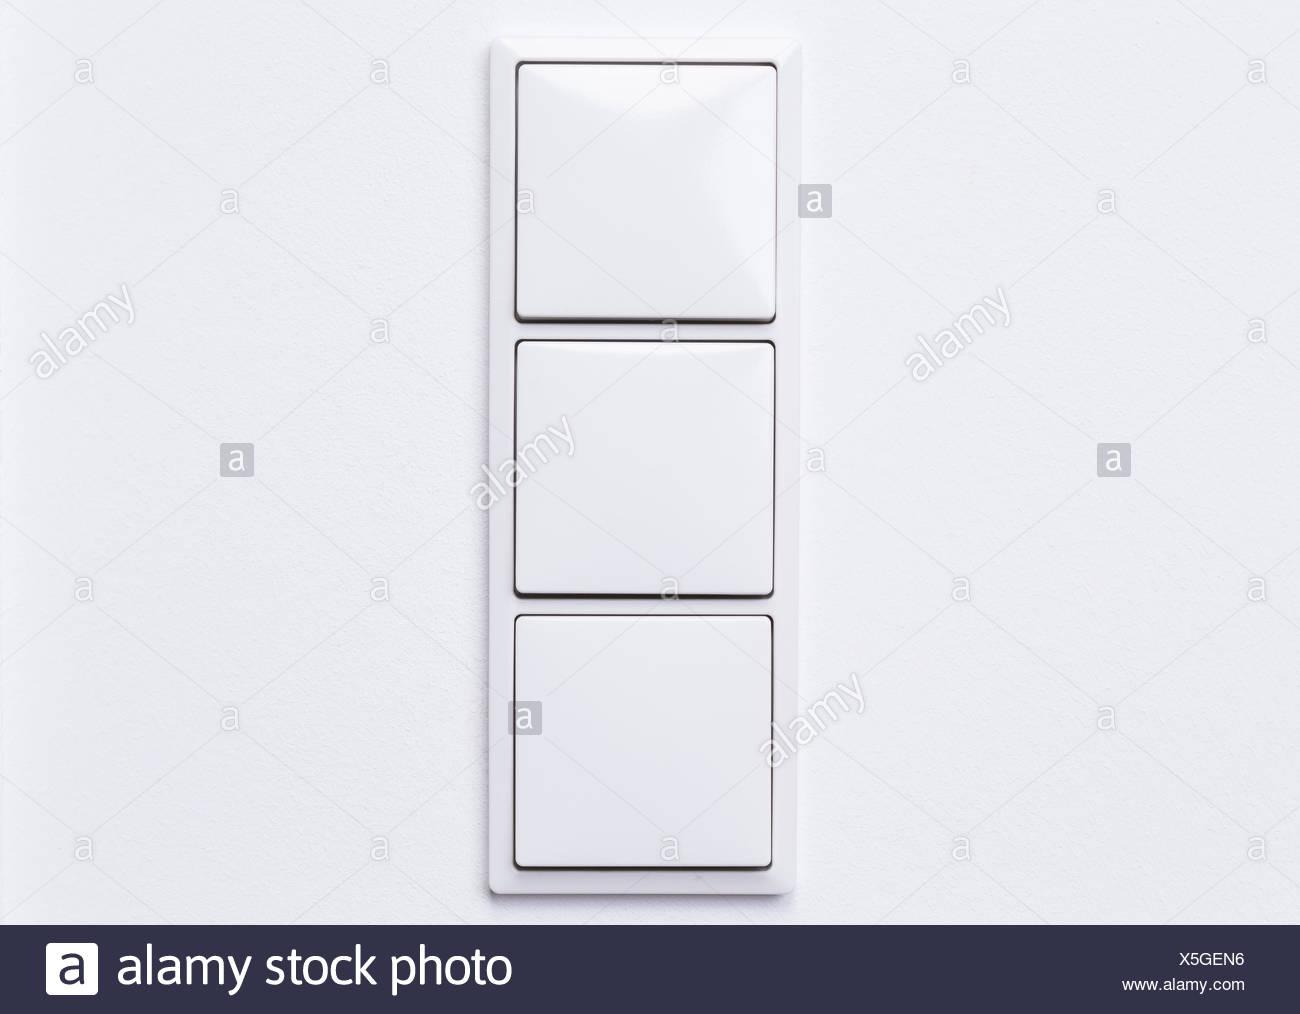 Stromschalter Stock Photos & Stromschalter Stock Images - Alamy